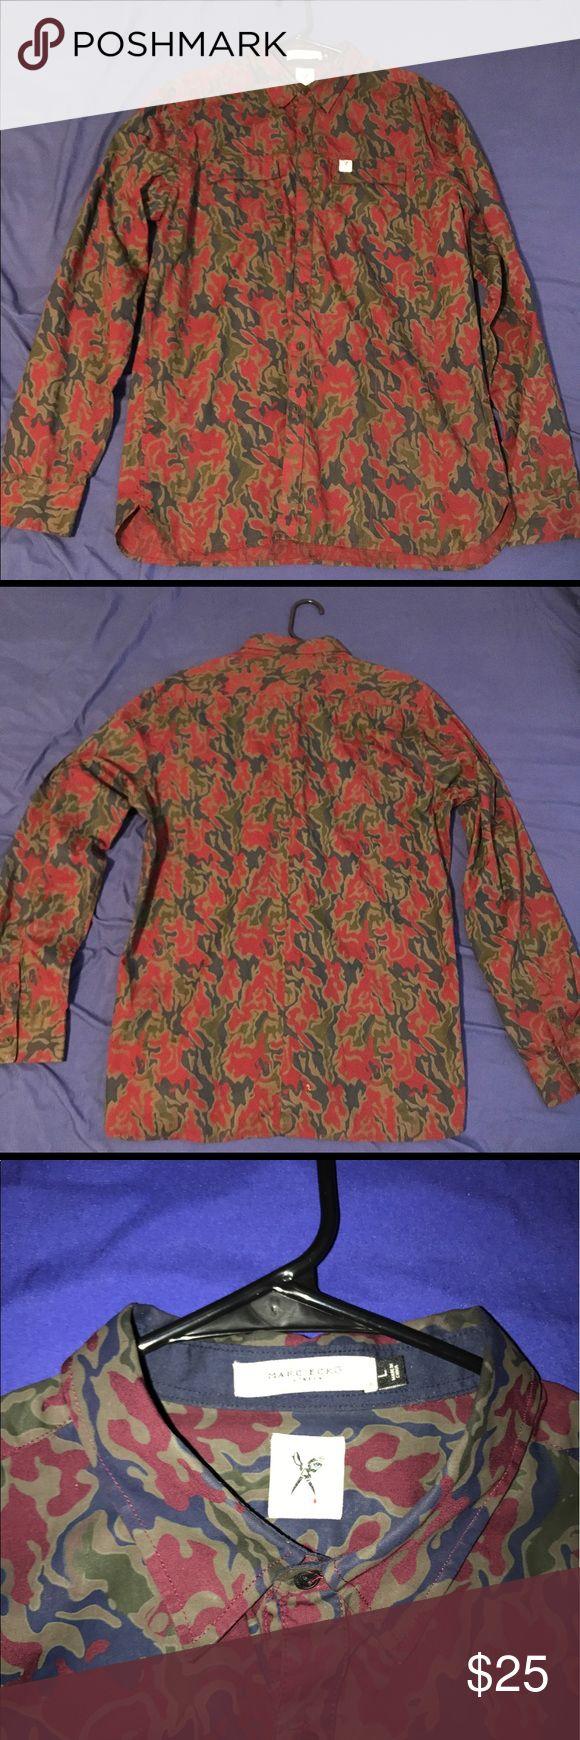 Marc Ecko Cut & Sew Camouflage Shirt Size L Marc Ecko Cut & Sew Shirt. worn 1x. Camouflage coloring. Marc Ecko Shirts Casual Button Down Shirts